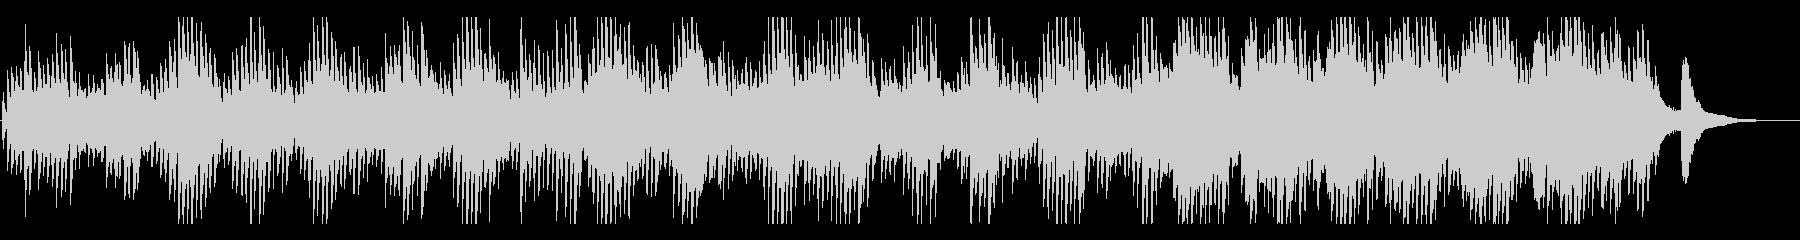 Meditative Angels's unreproduced waveform